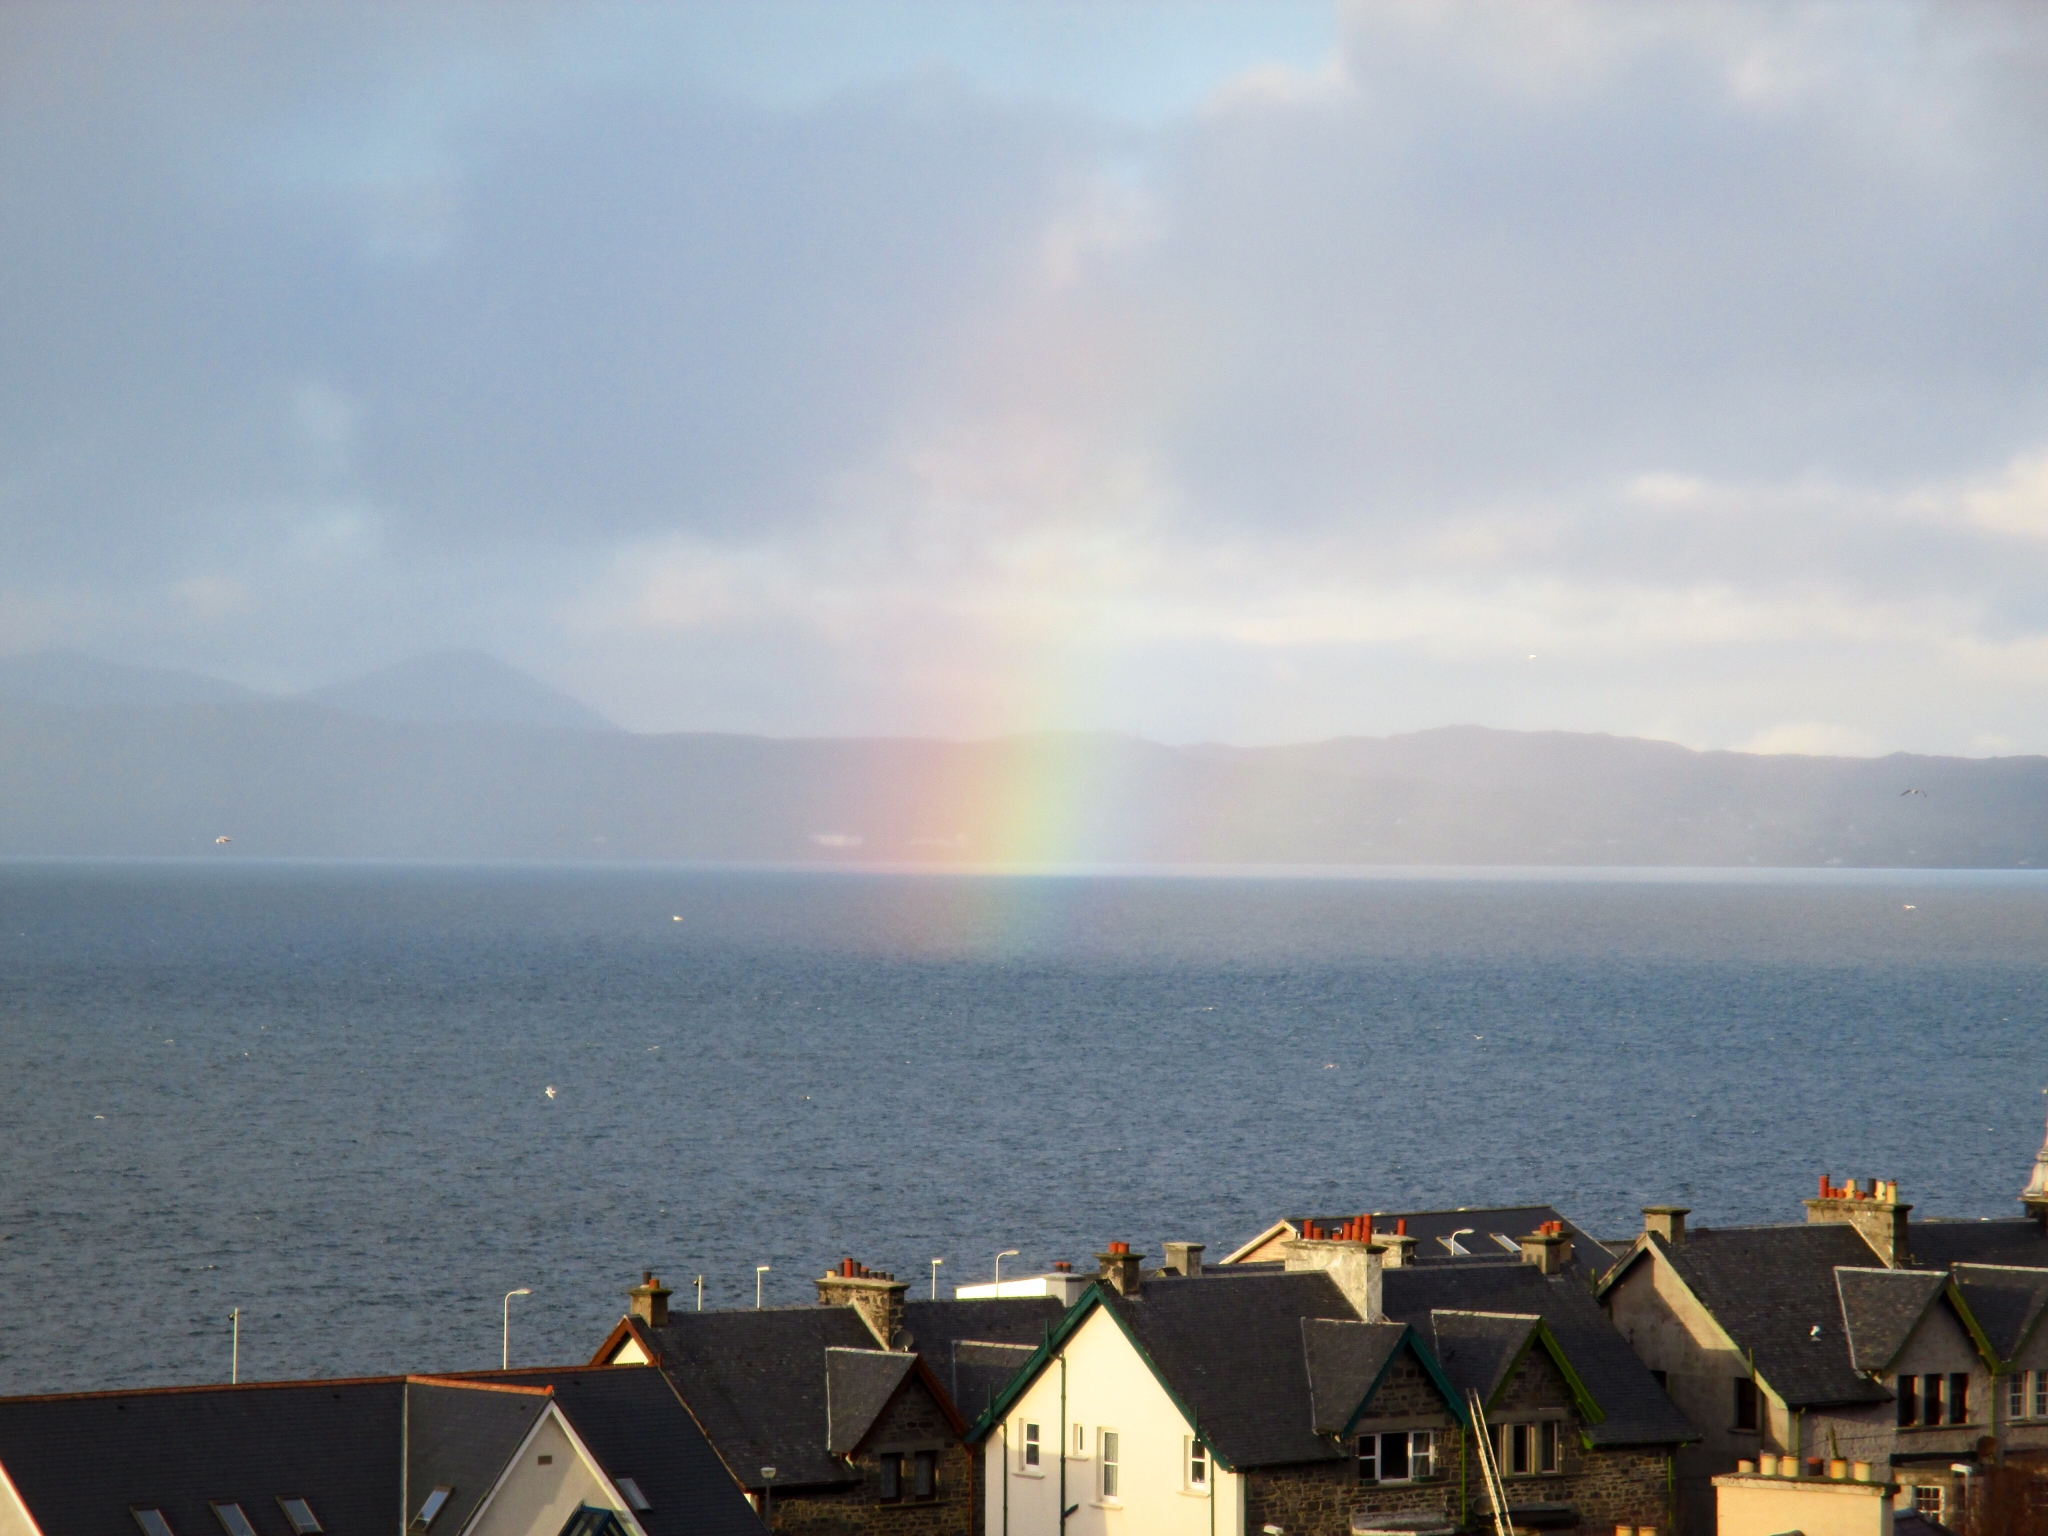 Another Rainbow, Mallaig, Scotland